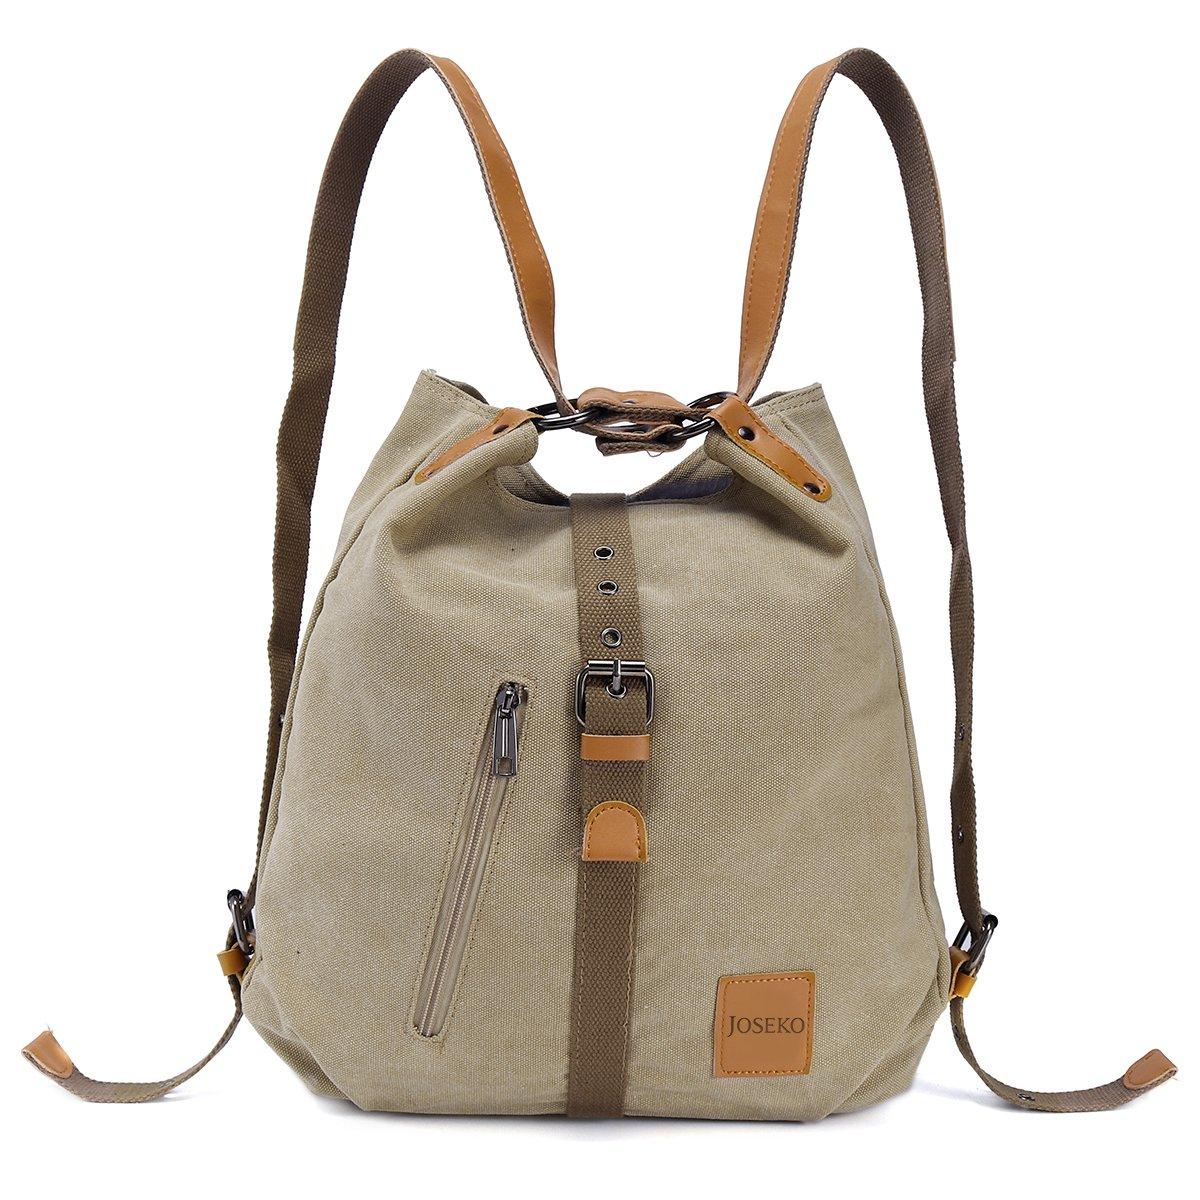 JOSEKO Fashion Shoulder Bag Rucksack, Canvas Multifunctional Casual Handbag Travel Backpack for Women Girls Ladies, Large Capacity Khaki 14.17 inch(L) x 3.94 inch(W) x 14.96 inch(H)